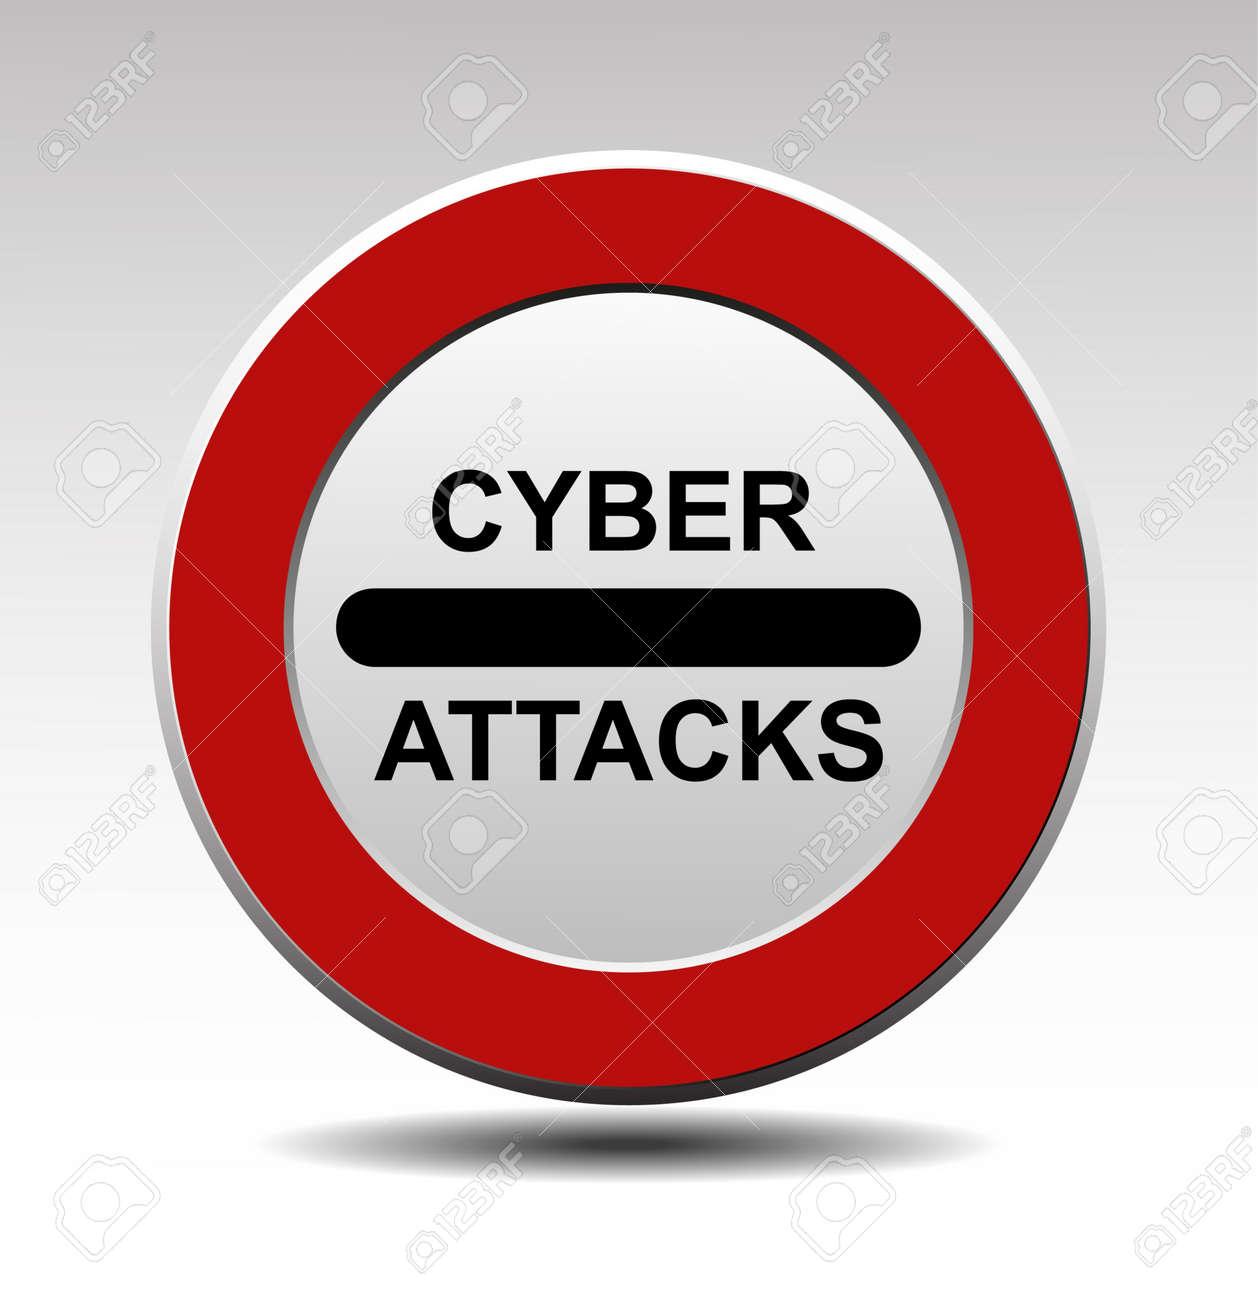 Cyber attacks vector sign Stock Vector - 17443684